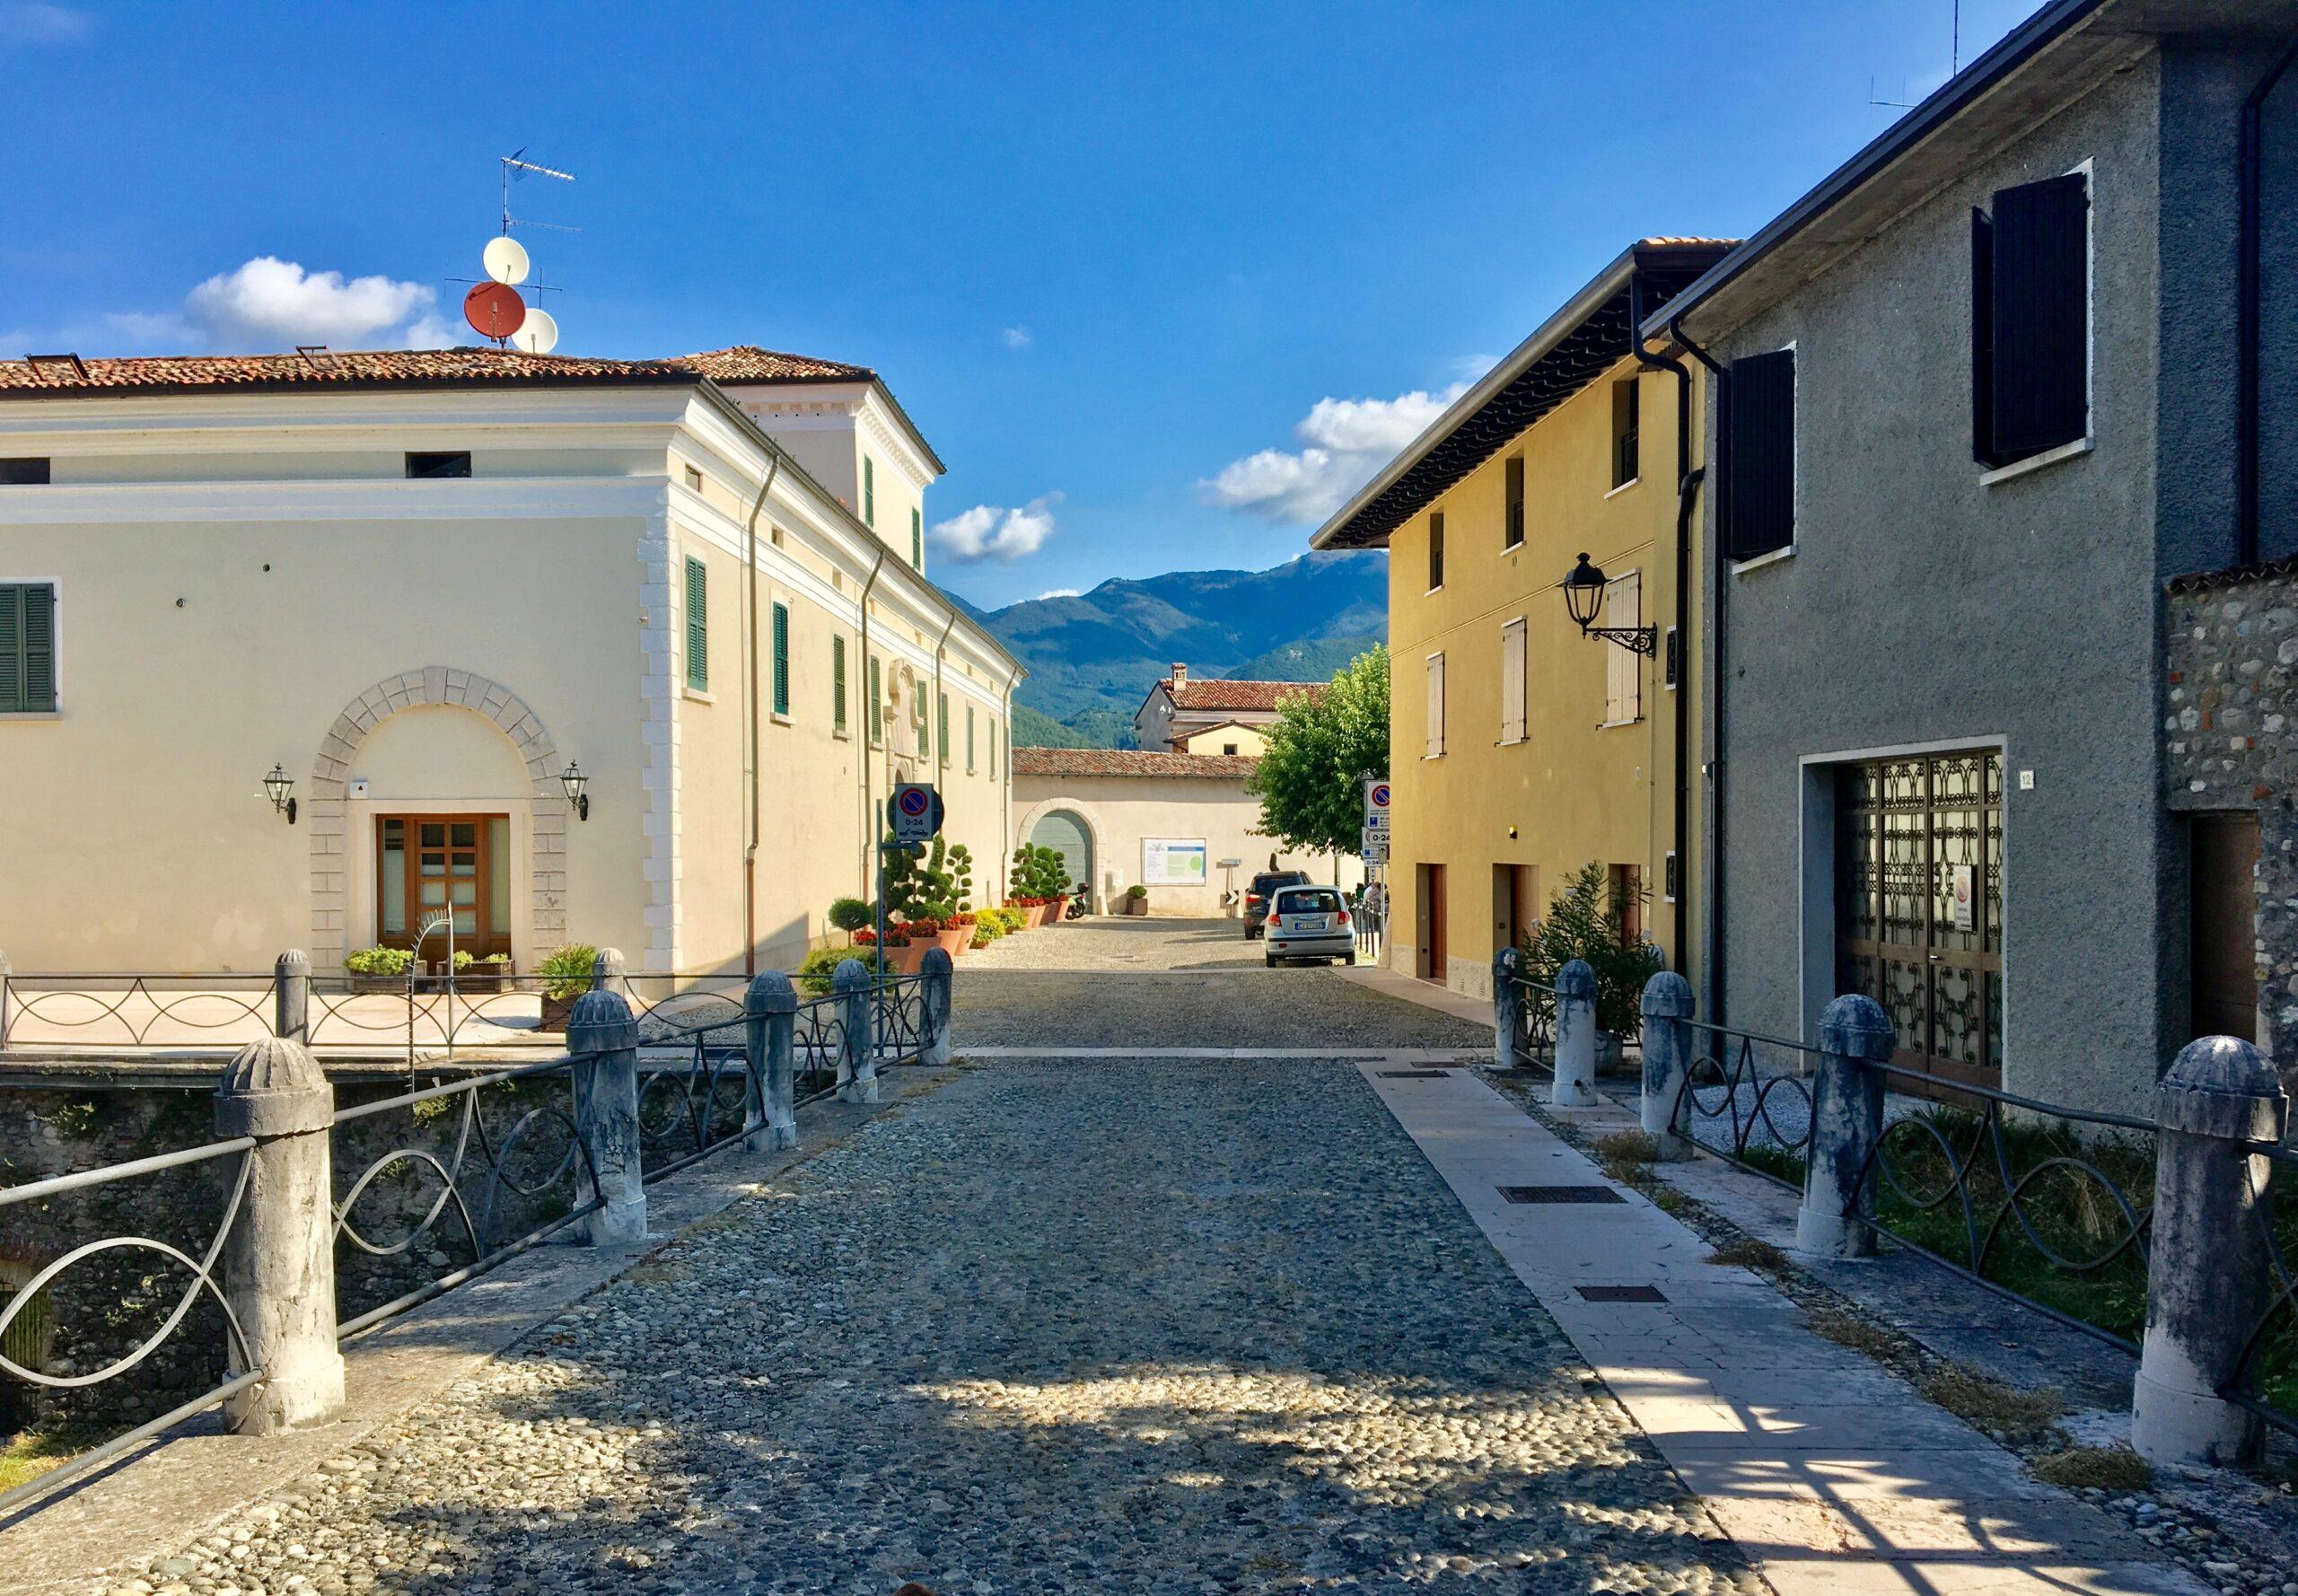 bike tour degustazione olio San Felice del benaco